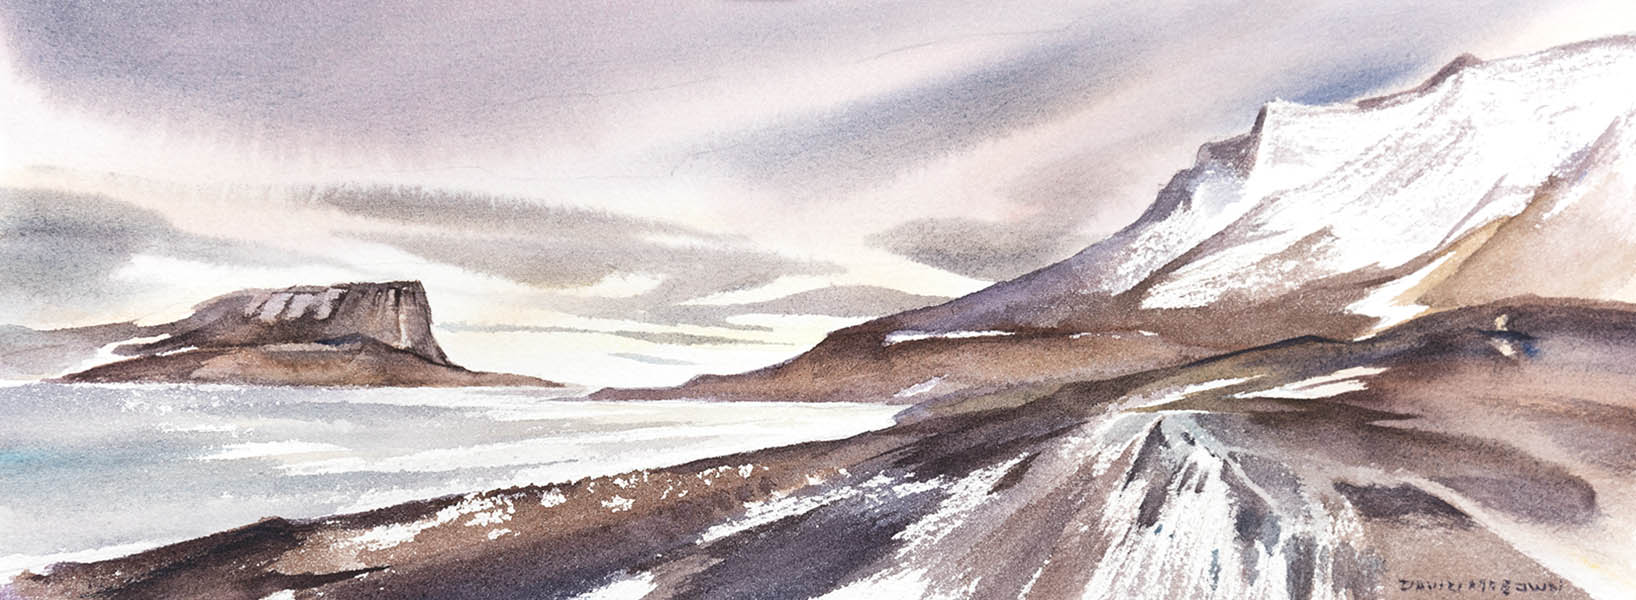 Shores of Beechey Island